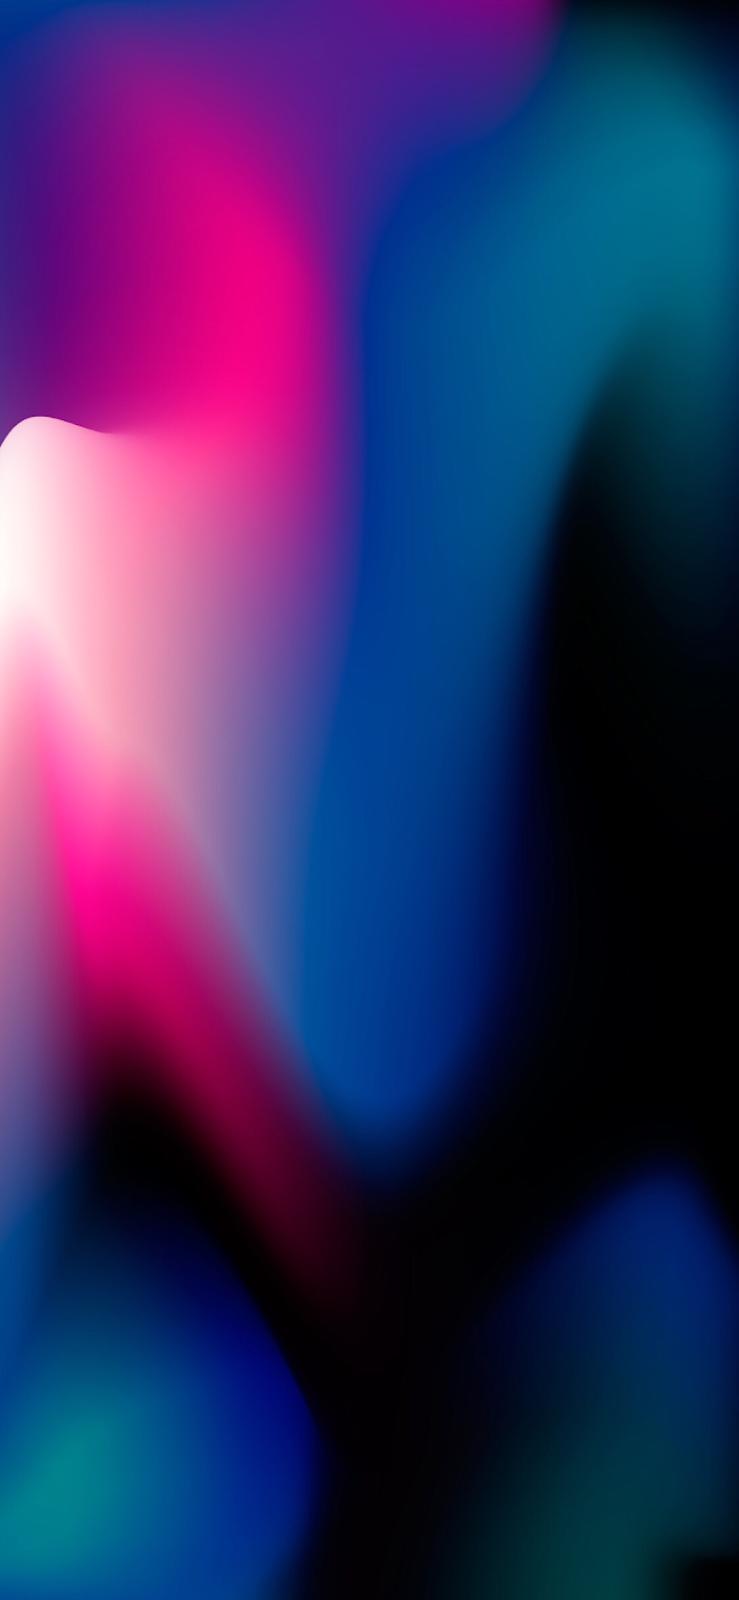 Colors fluid V2 by EvgeniyZemelko (iPhone X/XS/XR/XSMAX